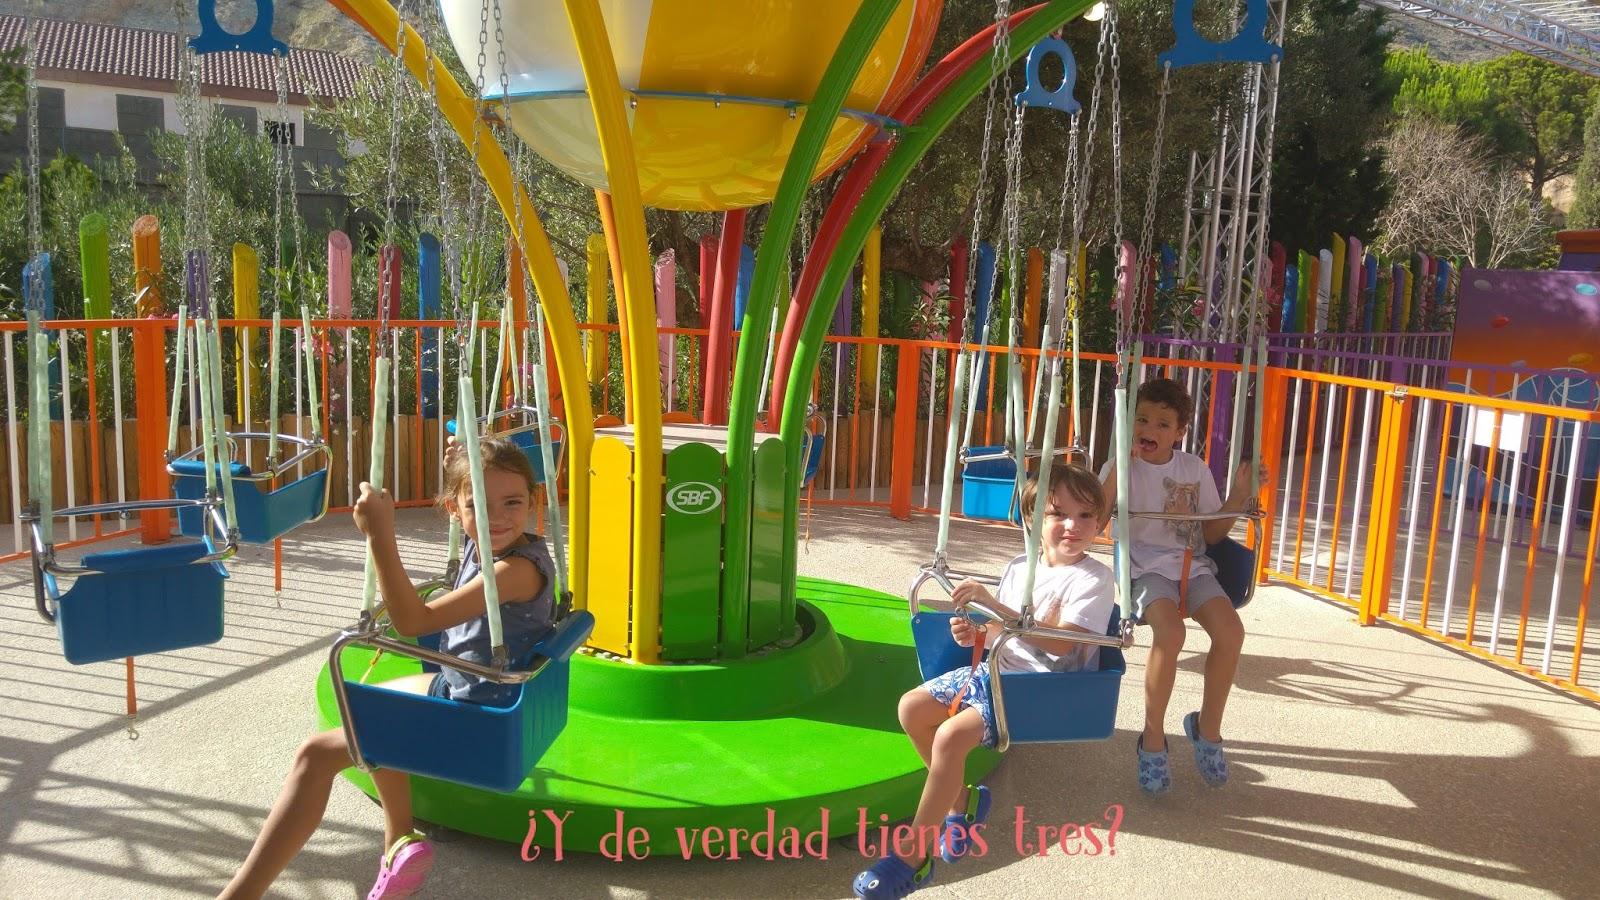 Atracciones-infantil-Terramítica-2019-blog-familianumerosa